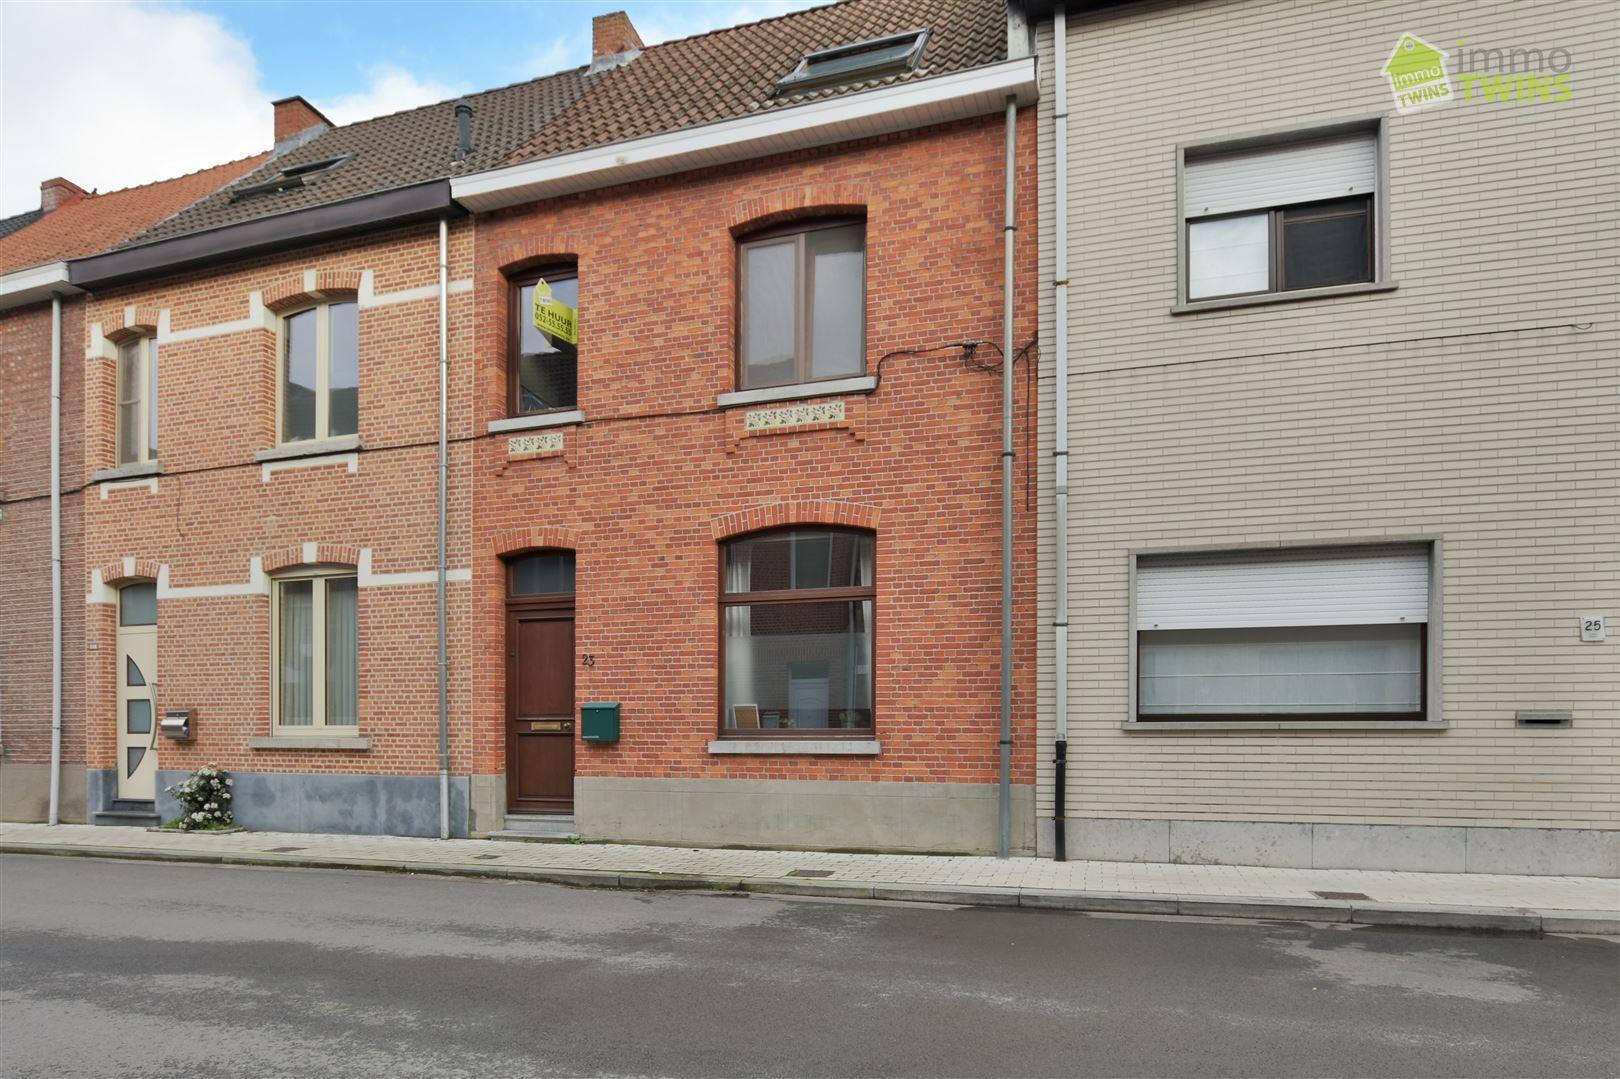 Foto 1 : Woning te 9200 SINT-GILLIS-BIJ-DENDERMONDE (België) - Prijs € 710